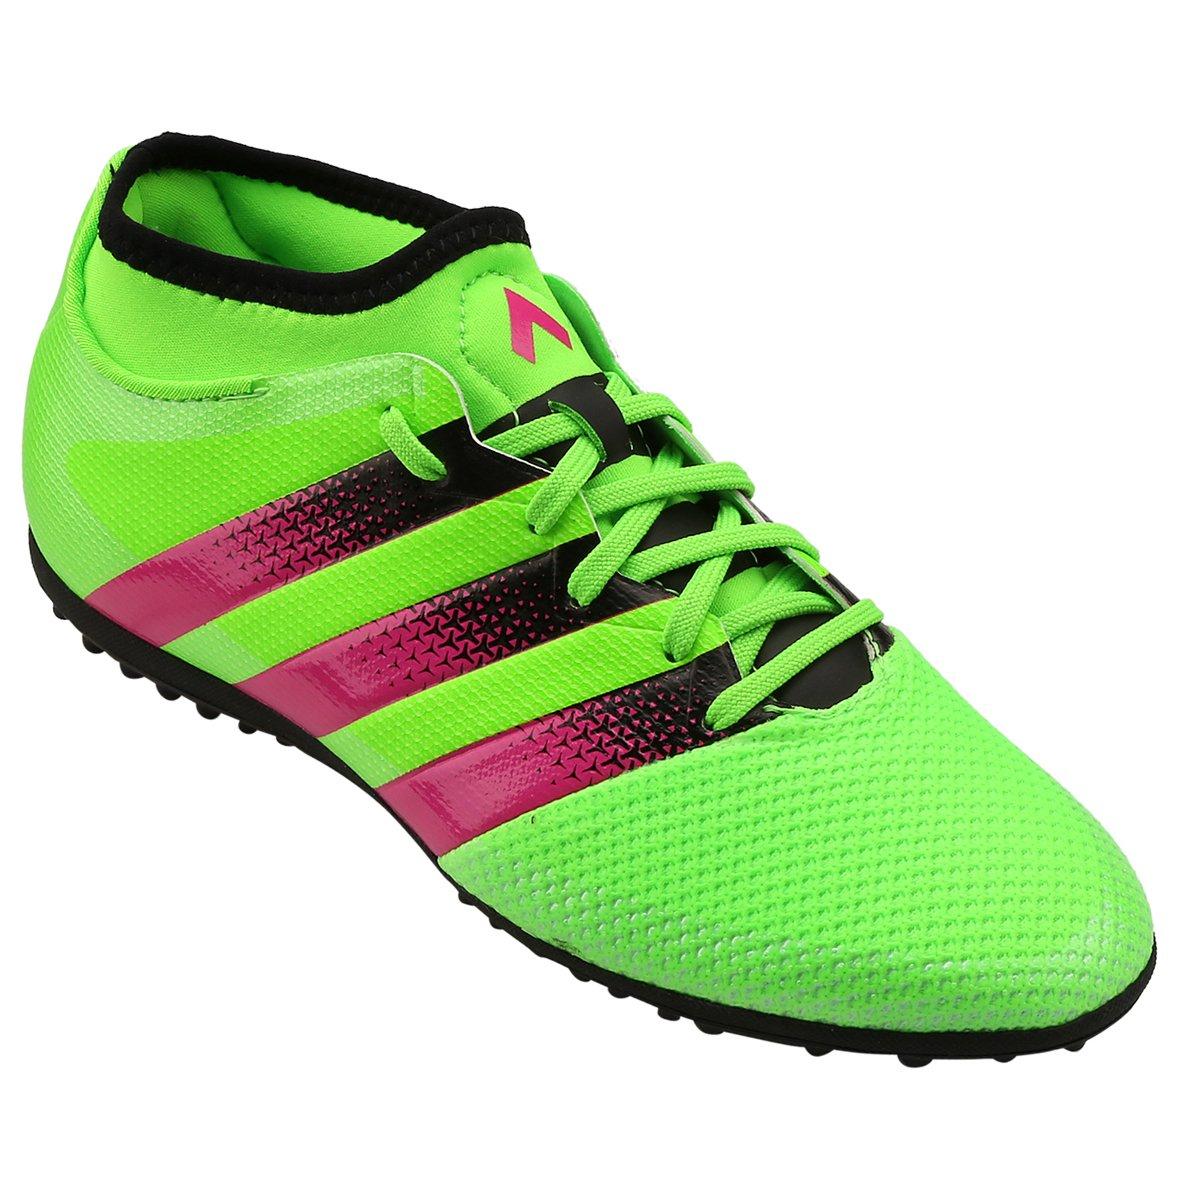 Chuteira Adidas Ace 16.3 Primesh TF Society Juvenil - Compre Agora ... a165773b7ed5b